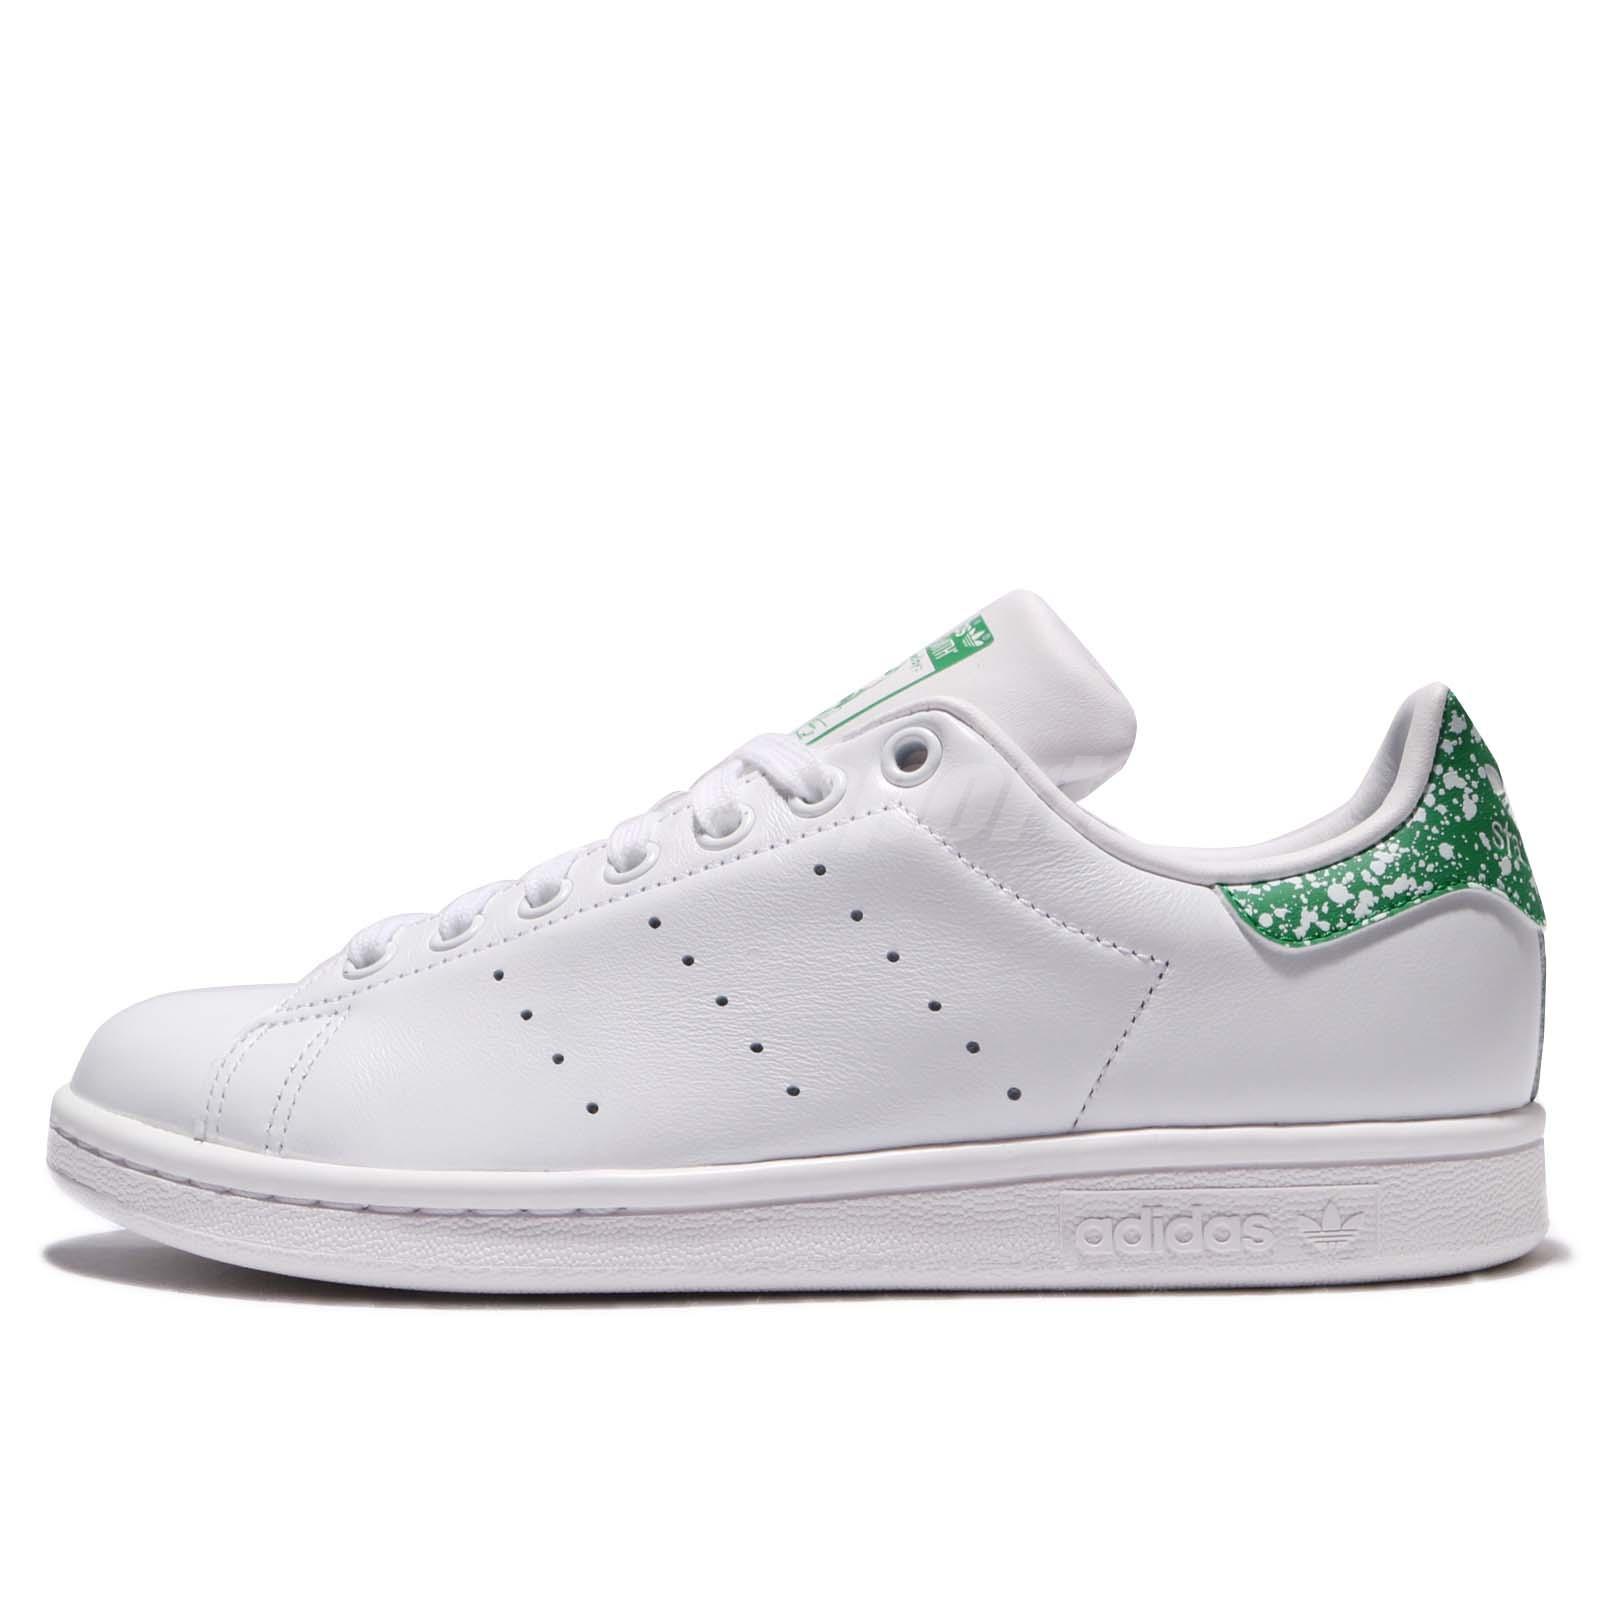 adidas originali stan smith w bianco verde le donne scarpe da ginnastica